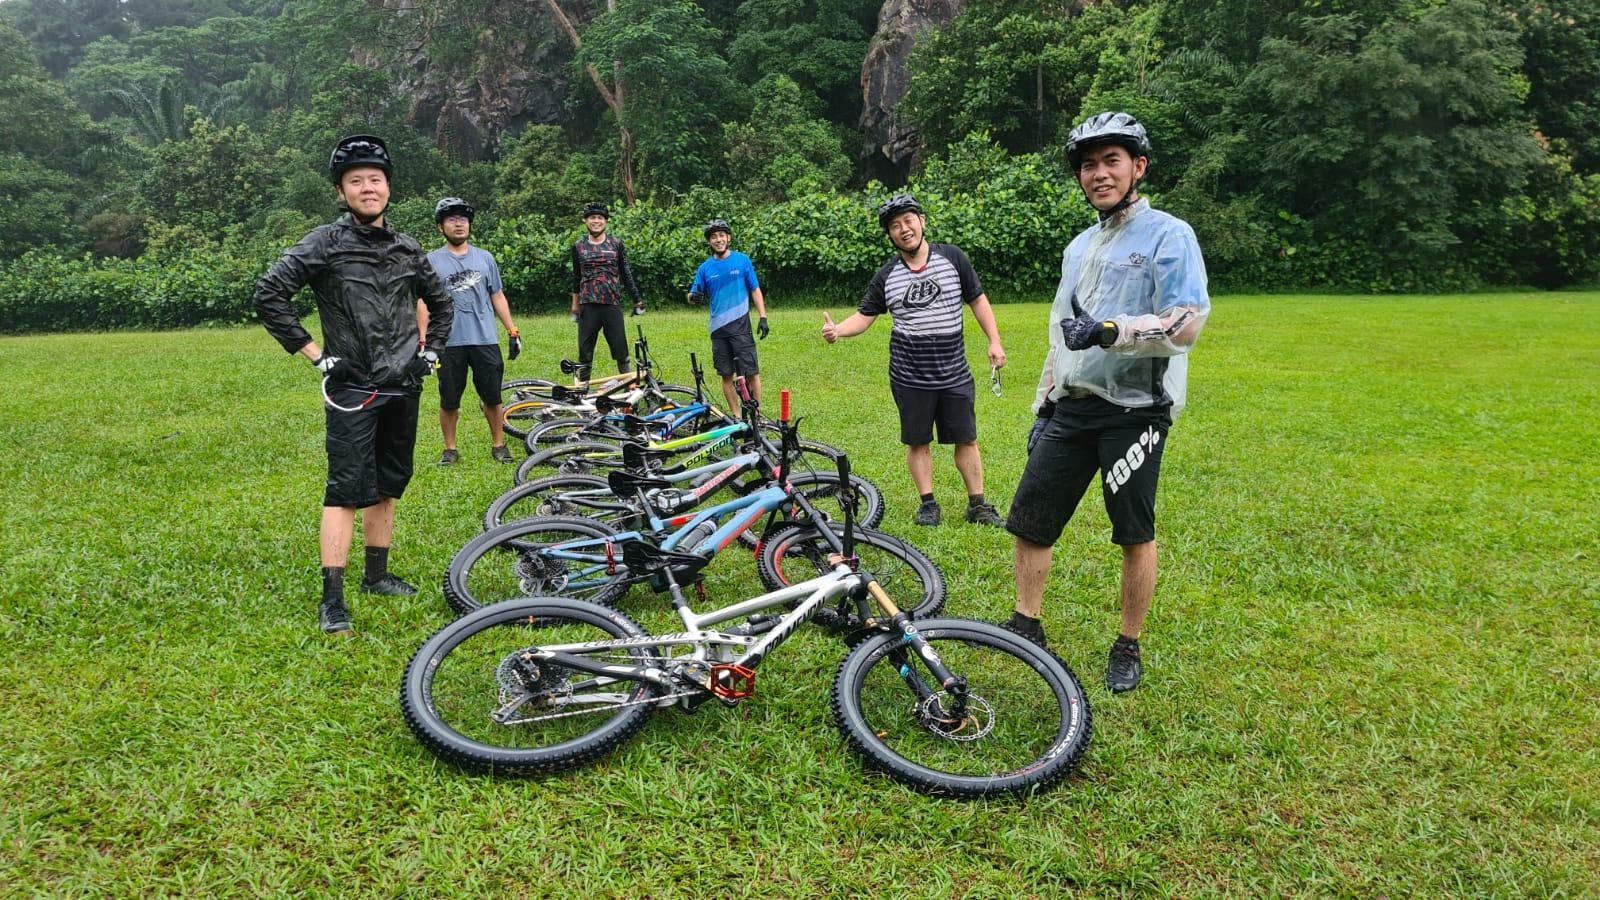 Kelvin organizes regular rides to Bukit Timah Nature Reserve